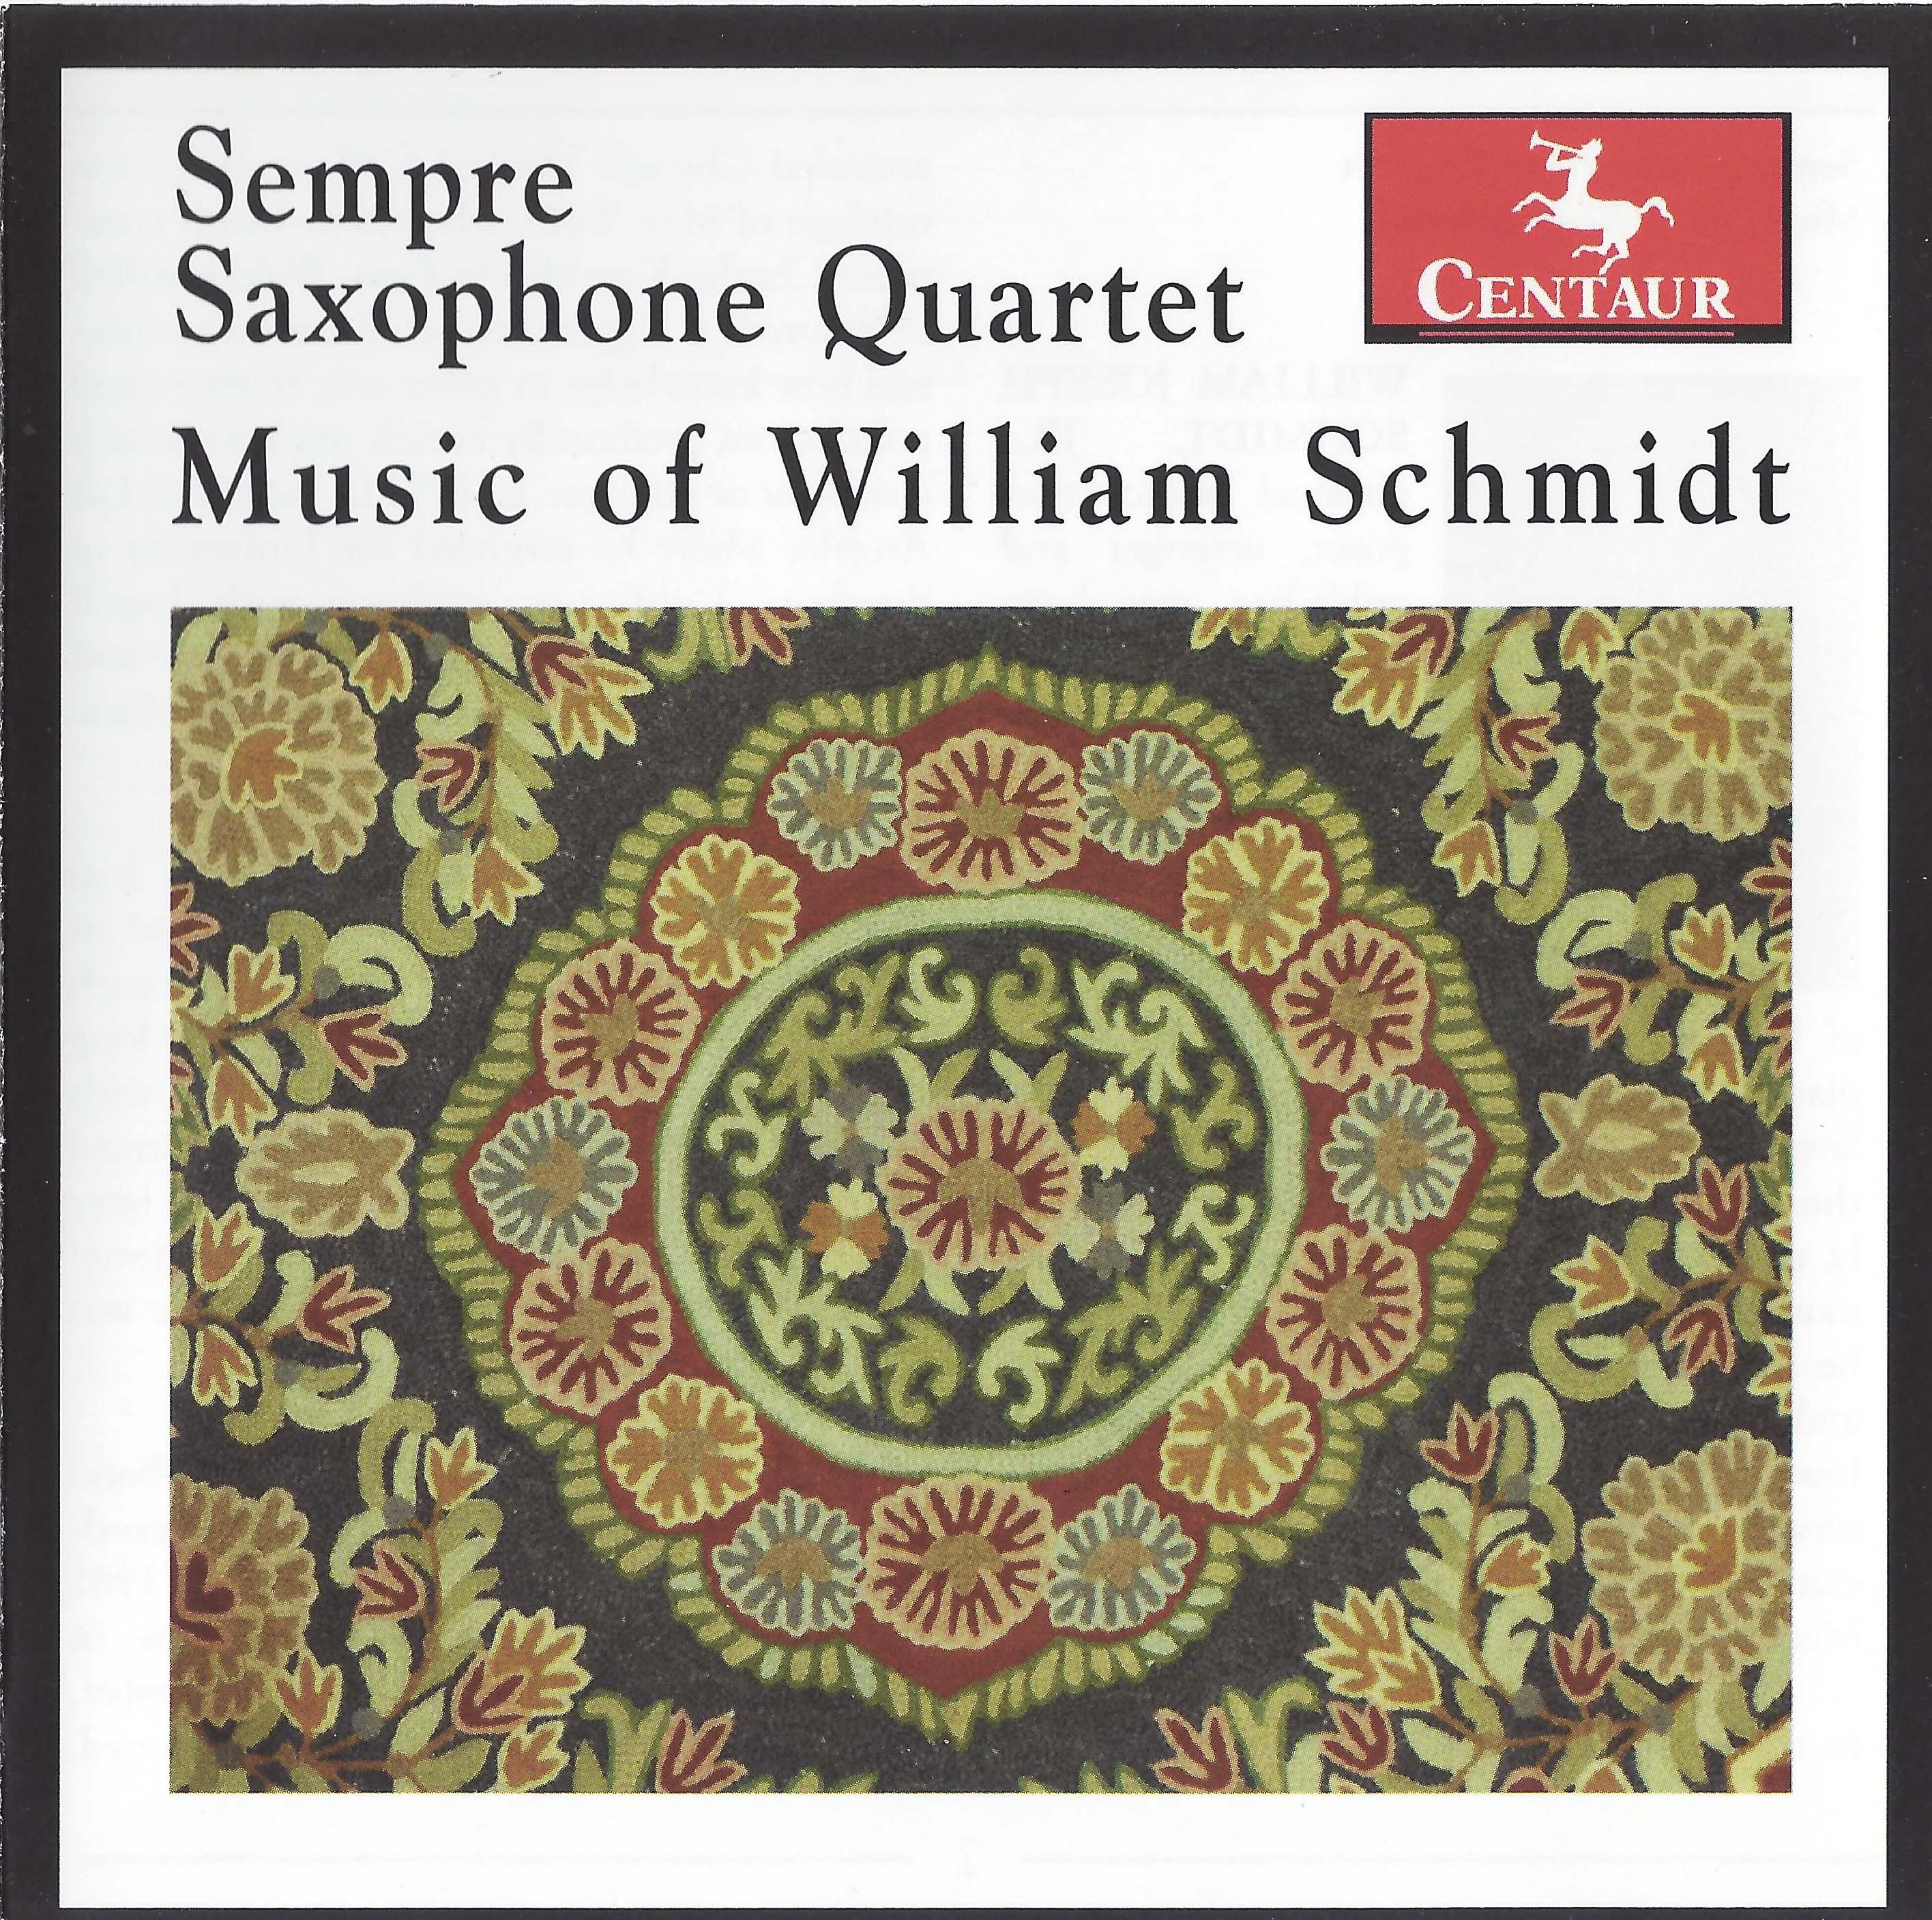 CRC 3262 Sempre Saxophone Quartet